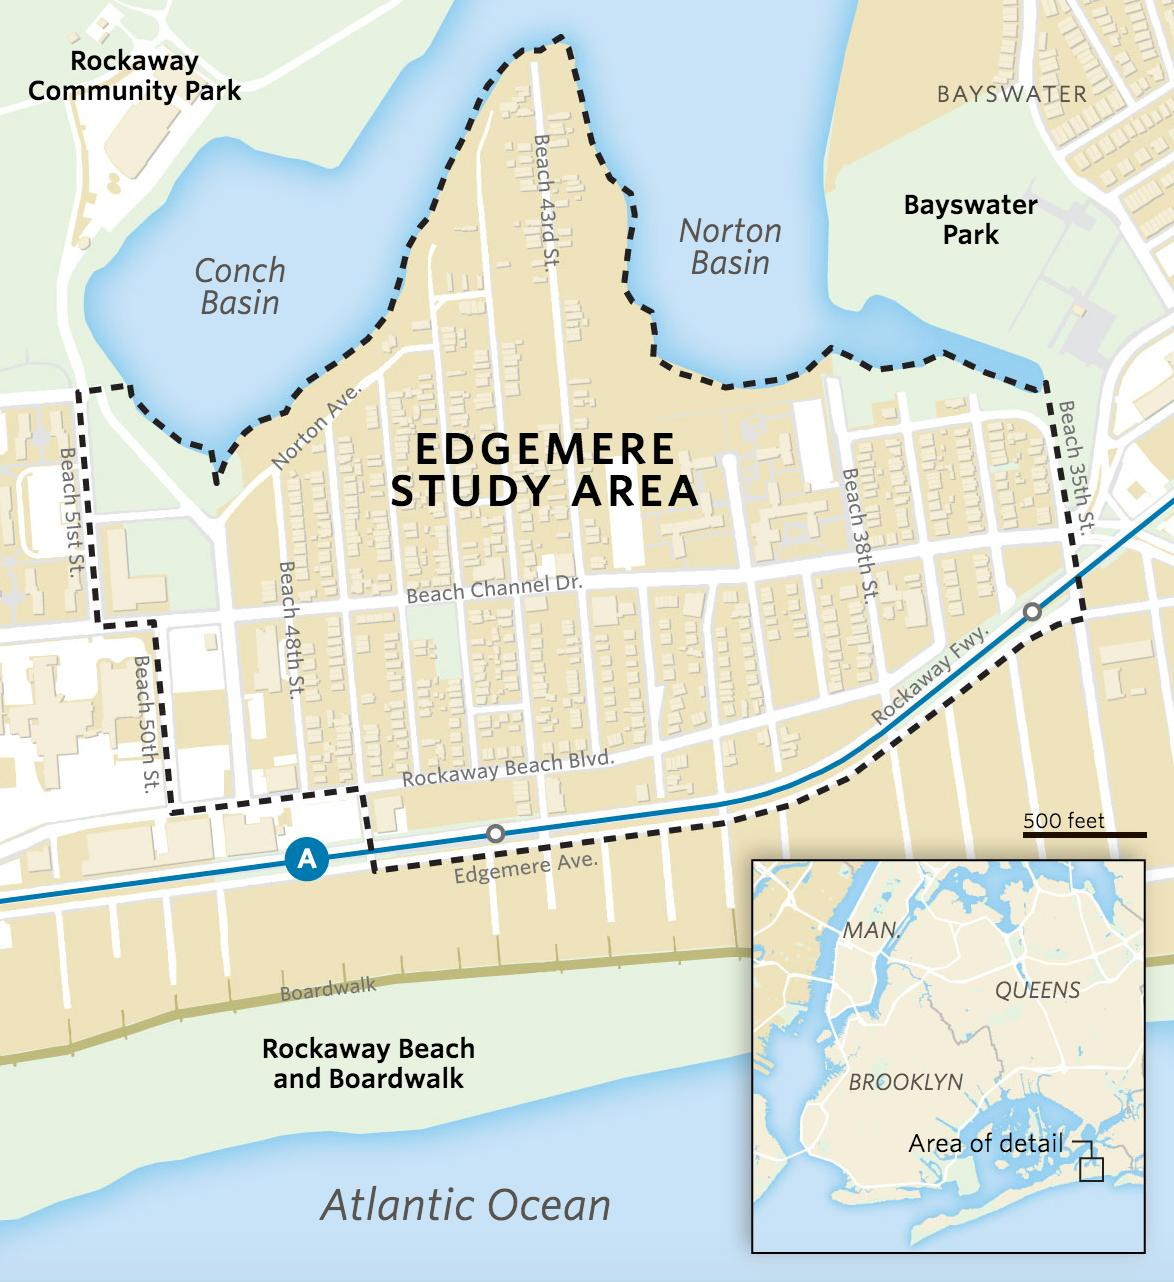 Edgmere Study Area